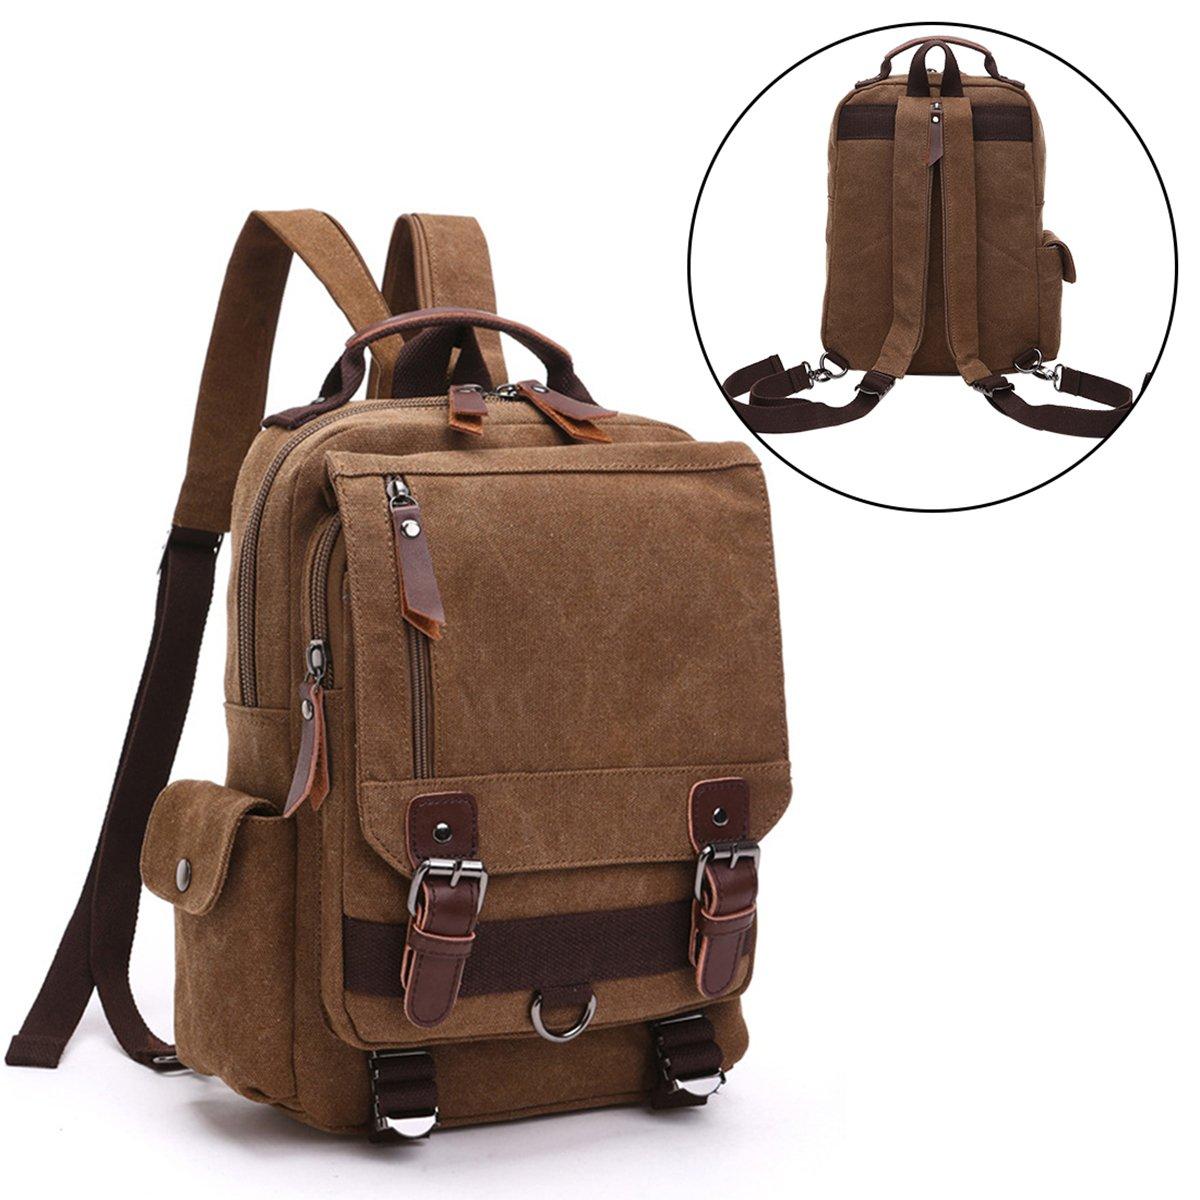 VentoMarea Cross Body Messenger Bag Sling Canvas Chest Bag Shoulder Backpack Travel Rucksack for Men, Women